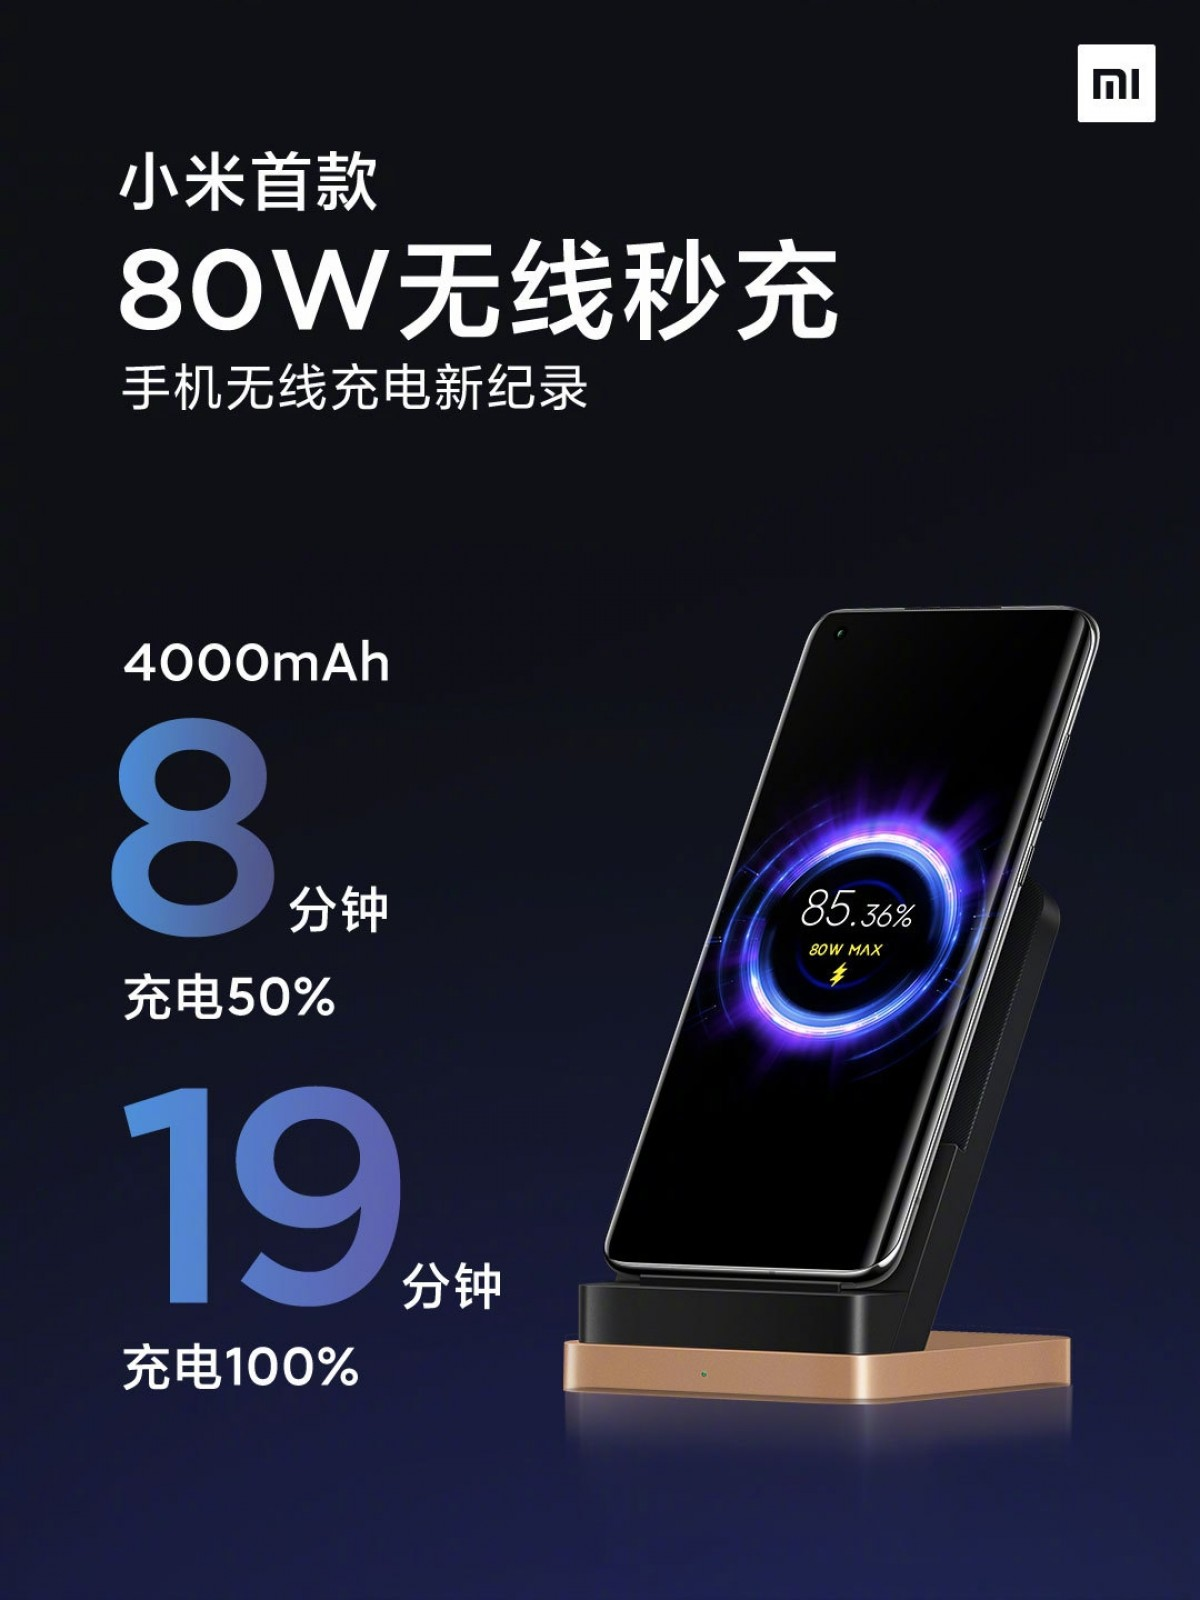 Xiaomi Mi 11 Pro porterà la ricarica wireless a 80 Watt?